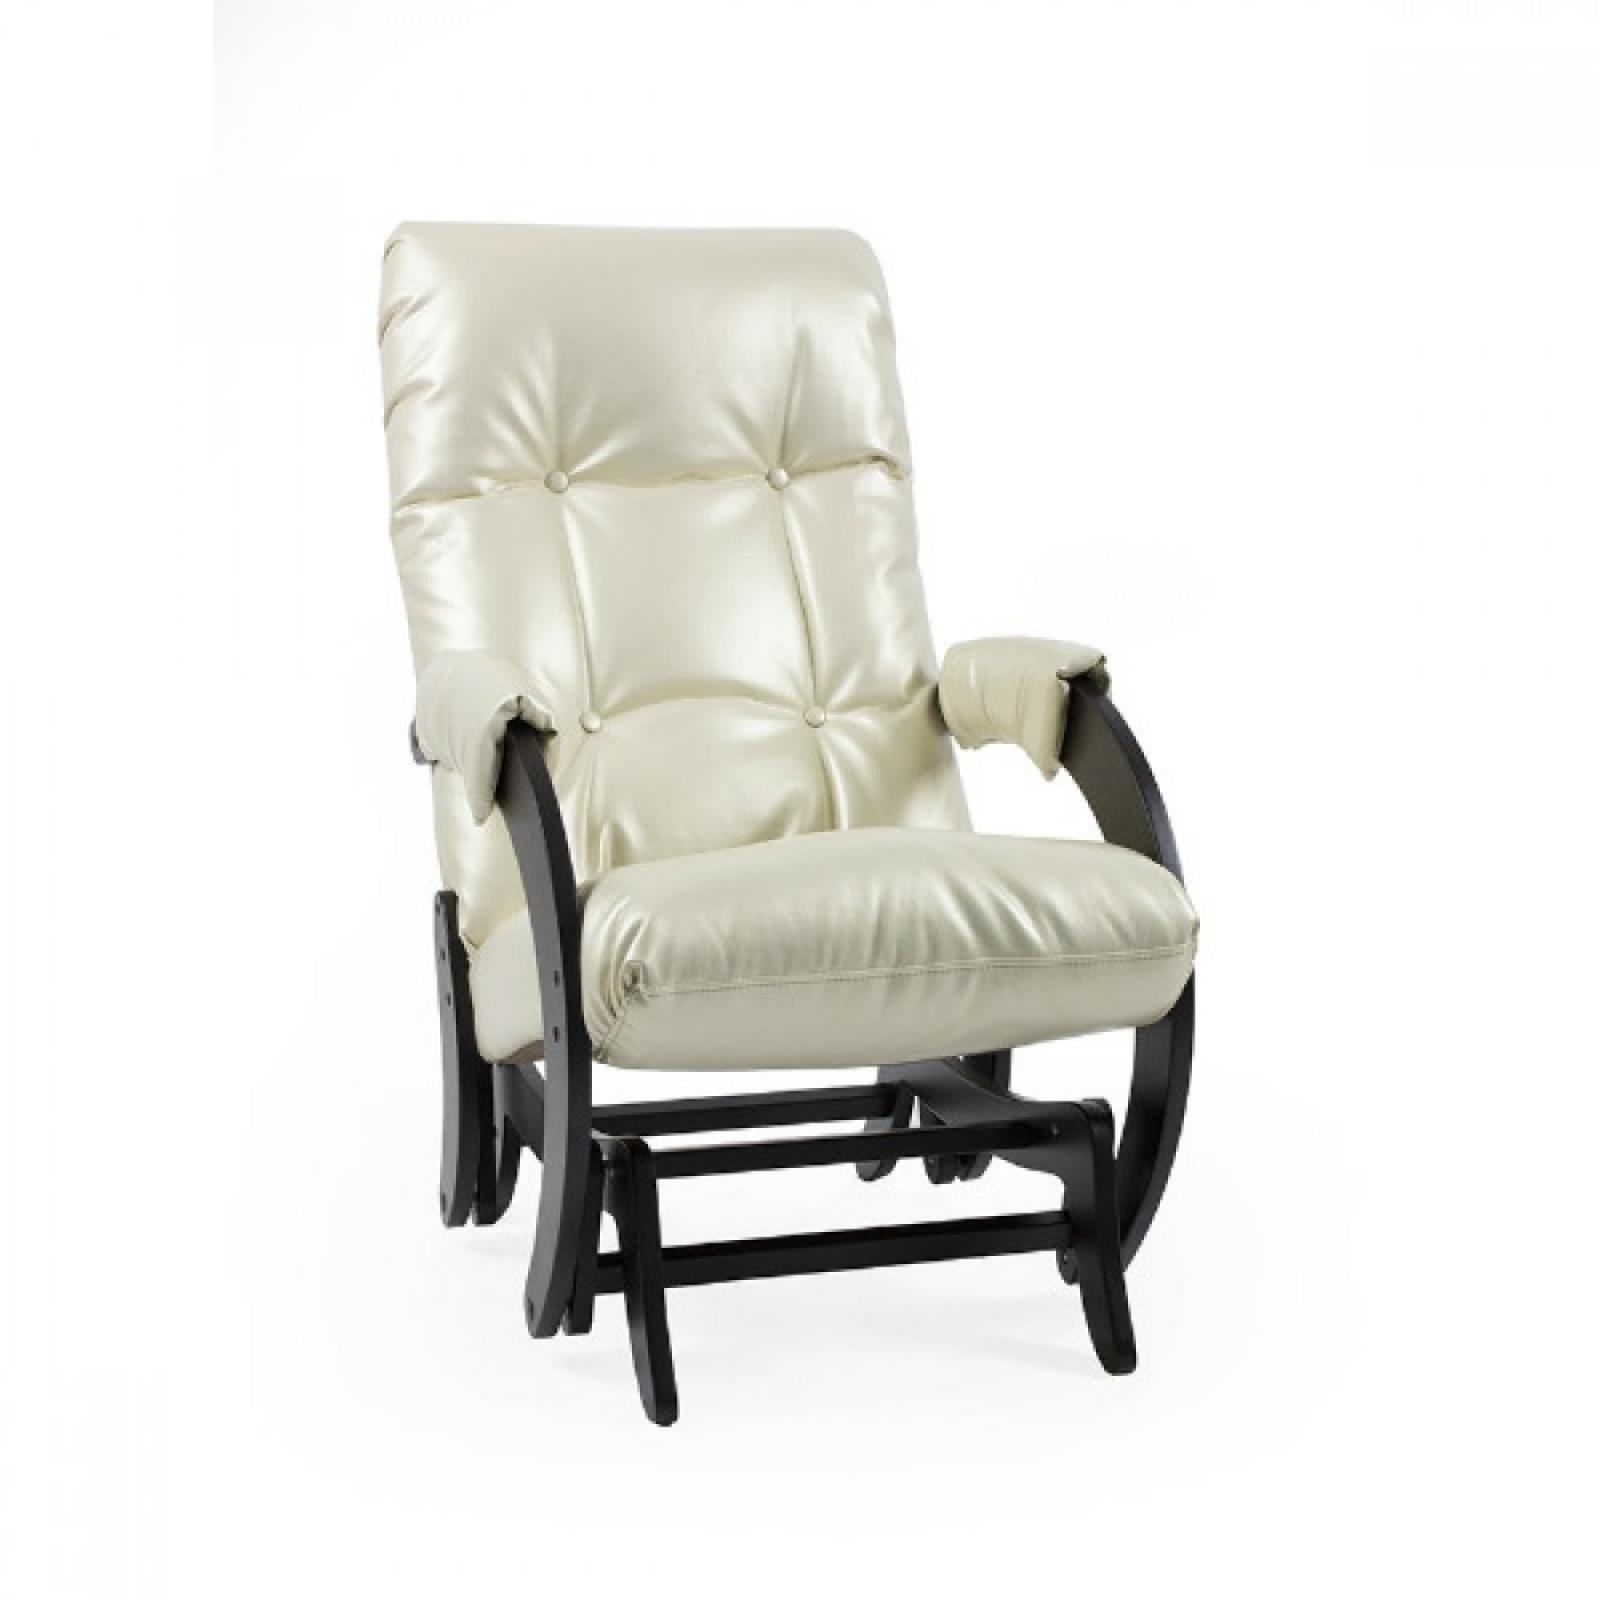 "Кресло-качалка ""Глайдер"", Модель 68 Венге/Орегон 106 - 1"